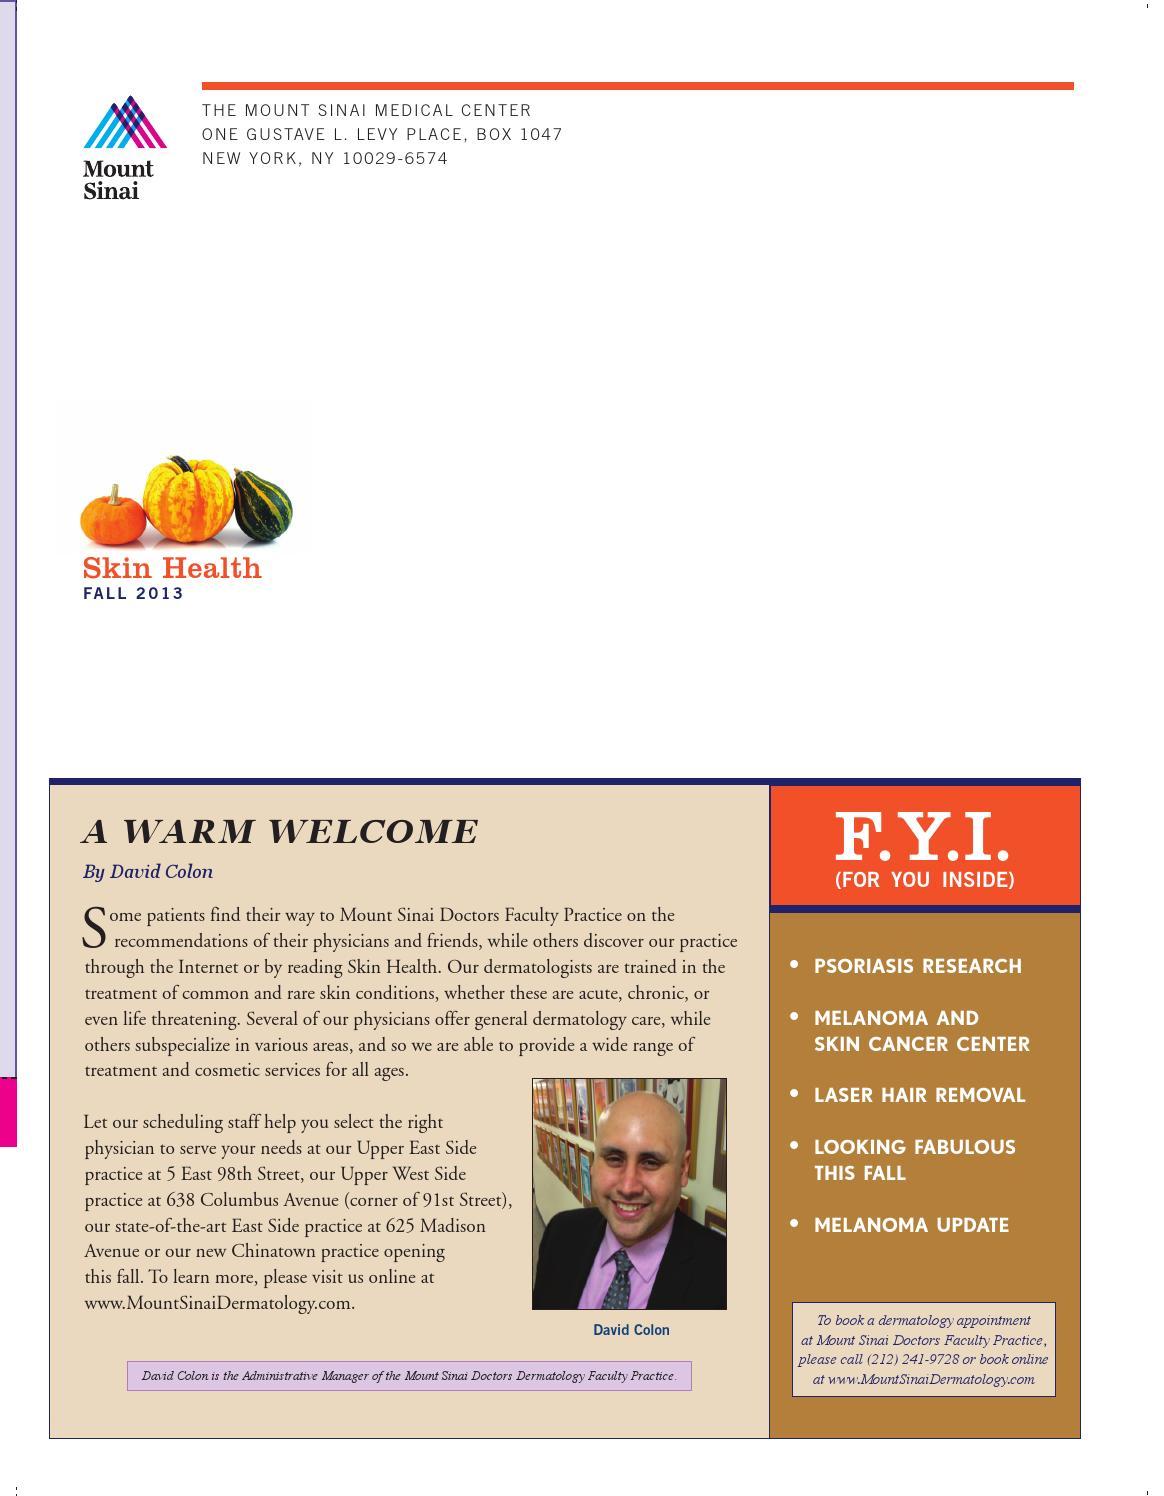 Skin Health - Fall 2013 Newsletter by Mount Sinai Health